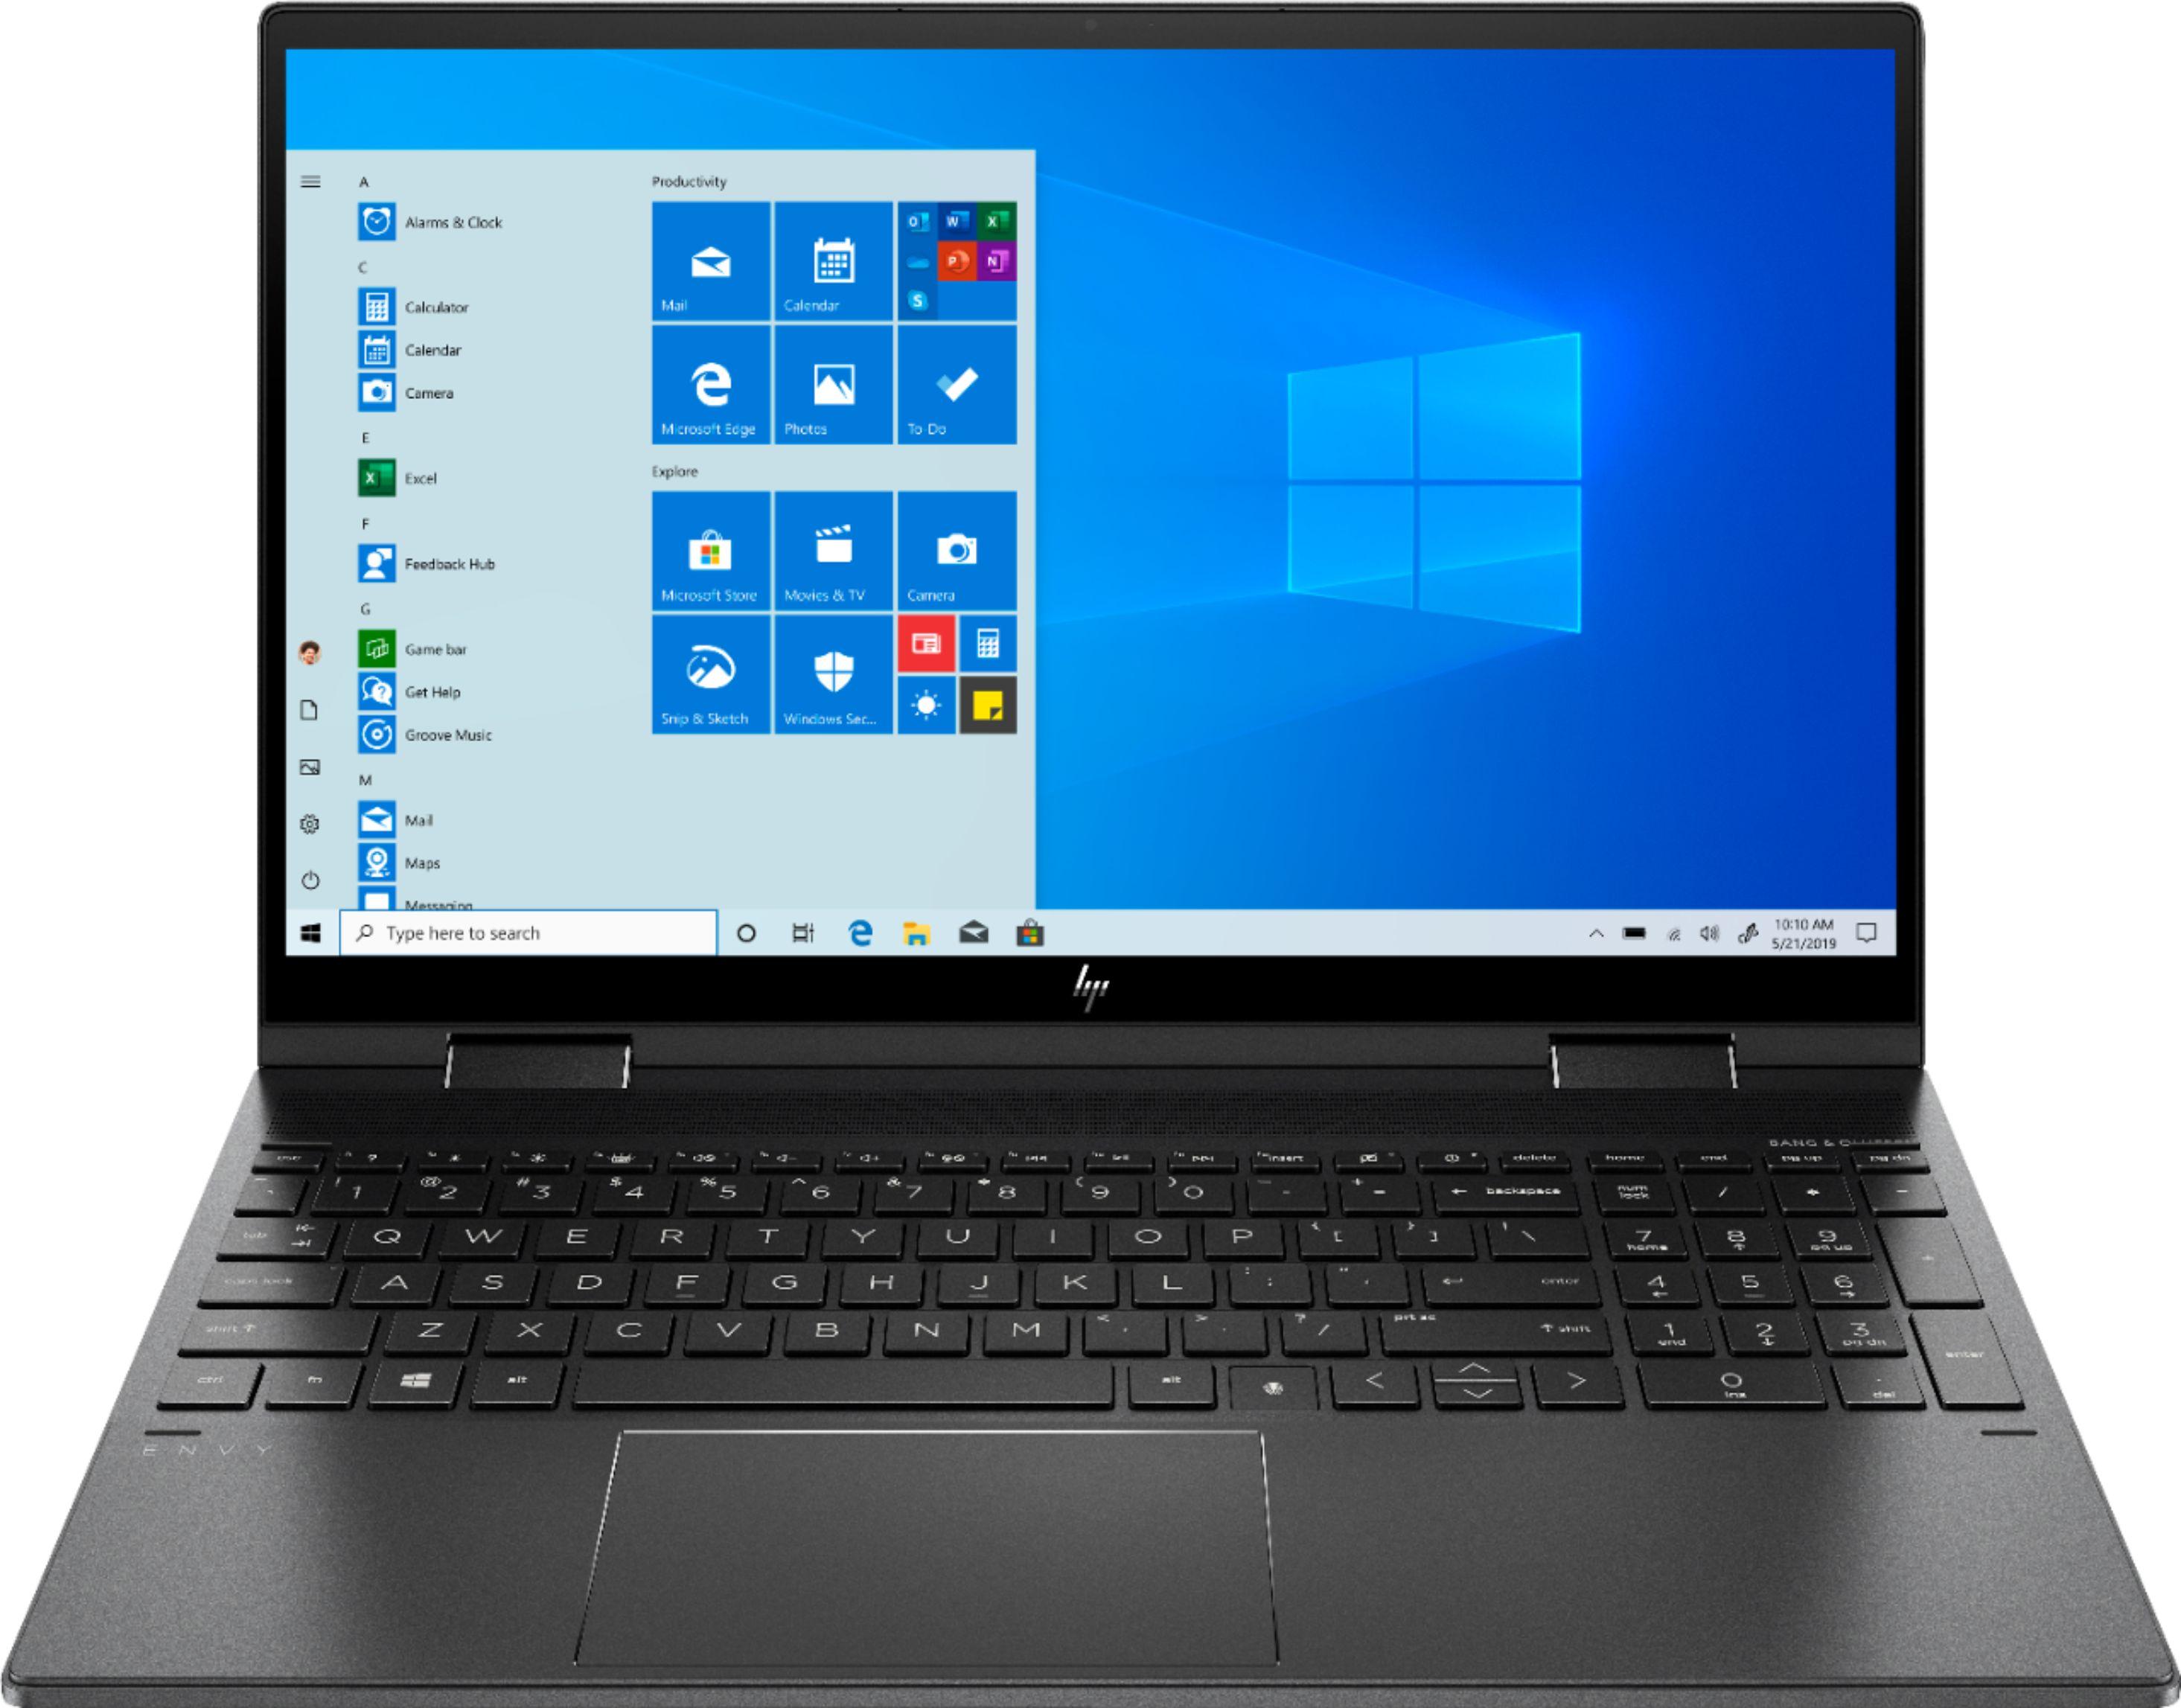 "HP - ENVY x360 2-in-1 15.6"" Touch-Screen Laptop - AMD Ryzen 7 - 8GB Memory - 512GB SSD - Nightfall Black $699.99"